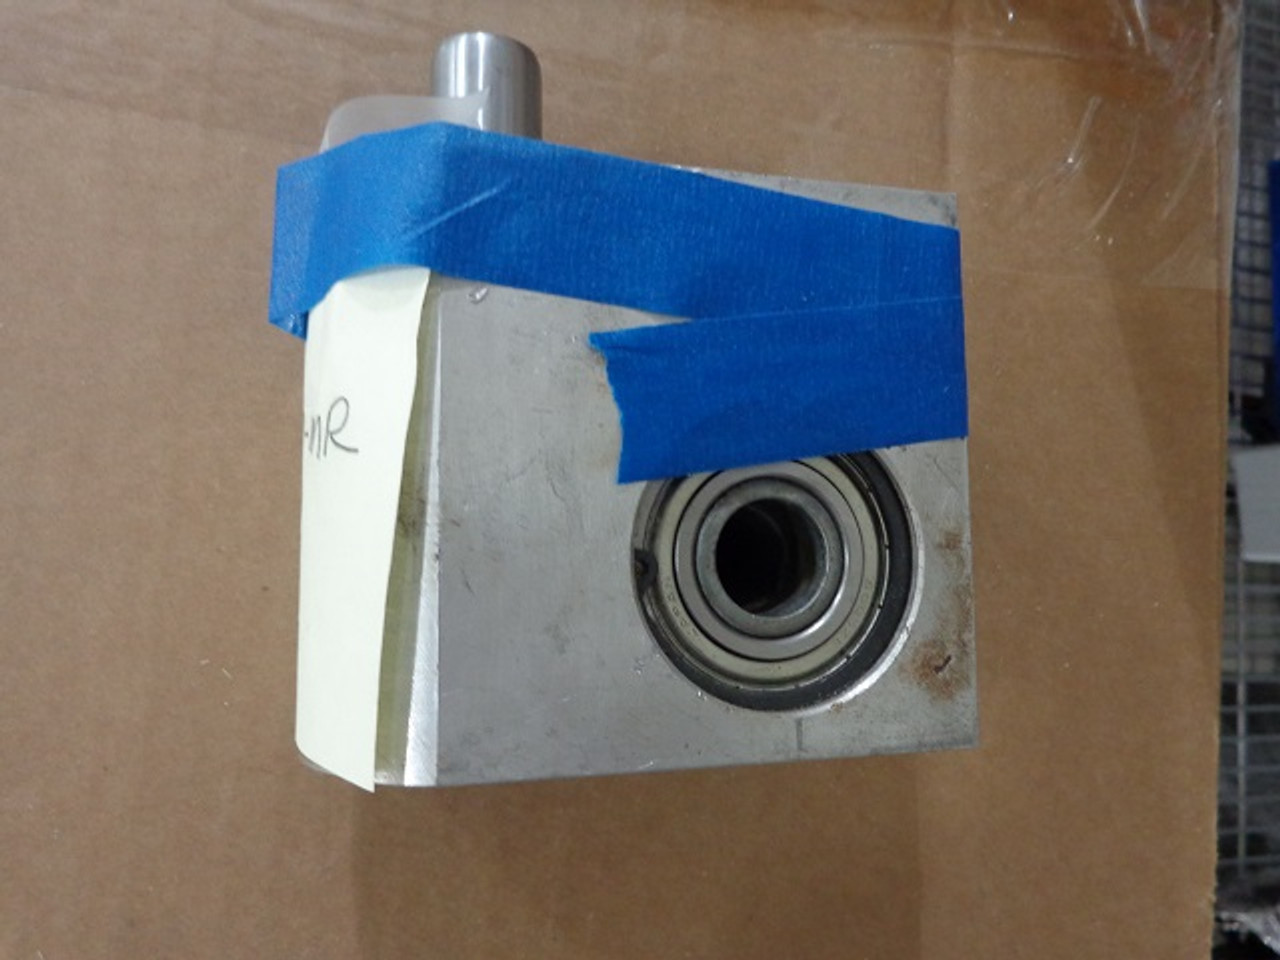 Folungwin CBB-ASM-MR-USED Conveyor Bearing Block Assembly (movable rail) - Folungwin